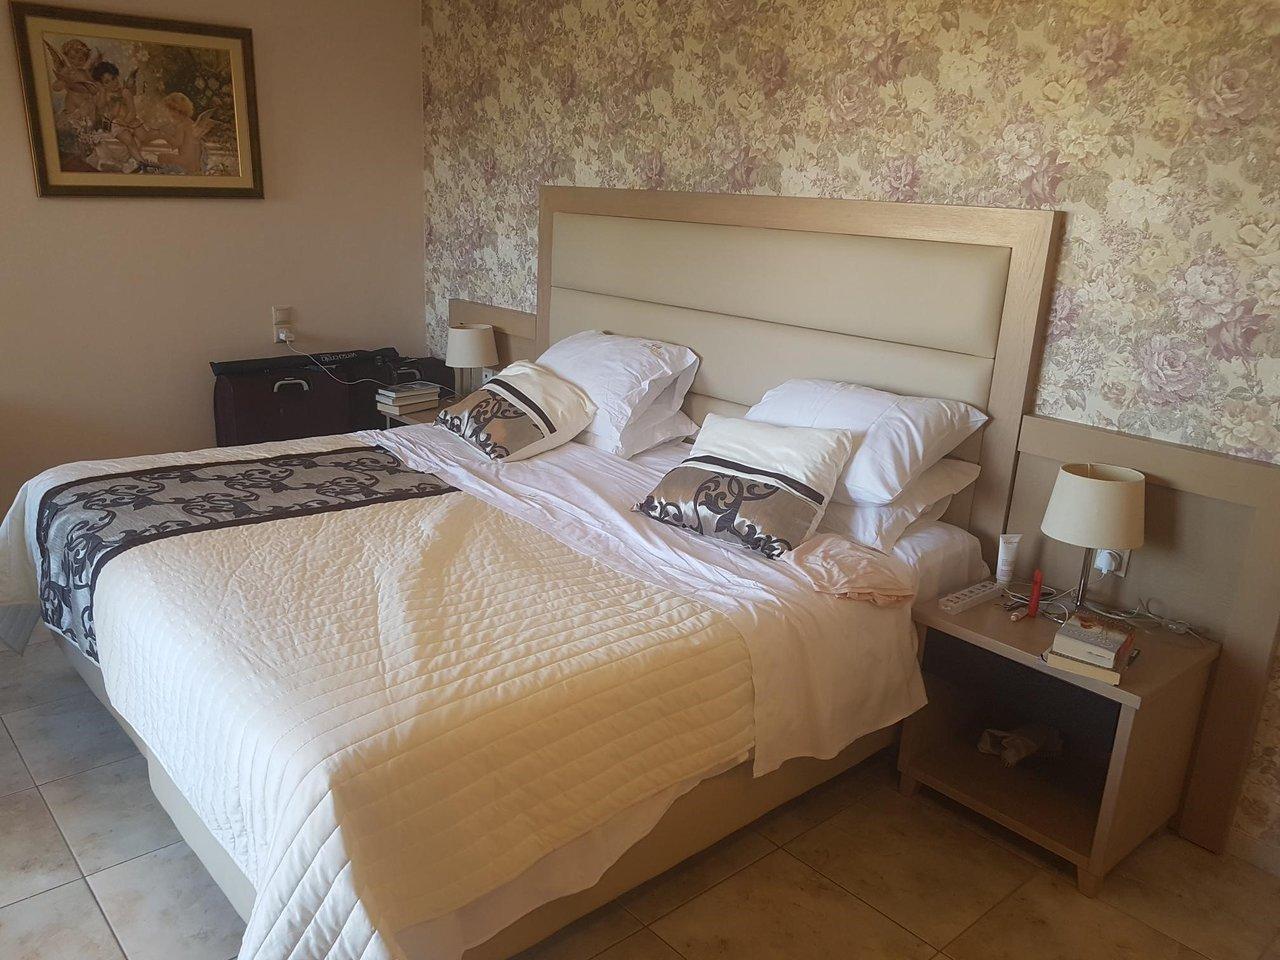 Twenty One Pilots Bedroom Awesome Pilot S Villas Luxury Suites Rooms & Reviews